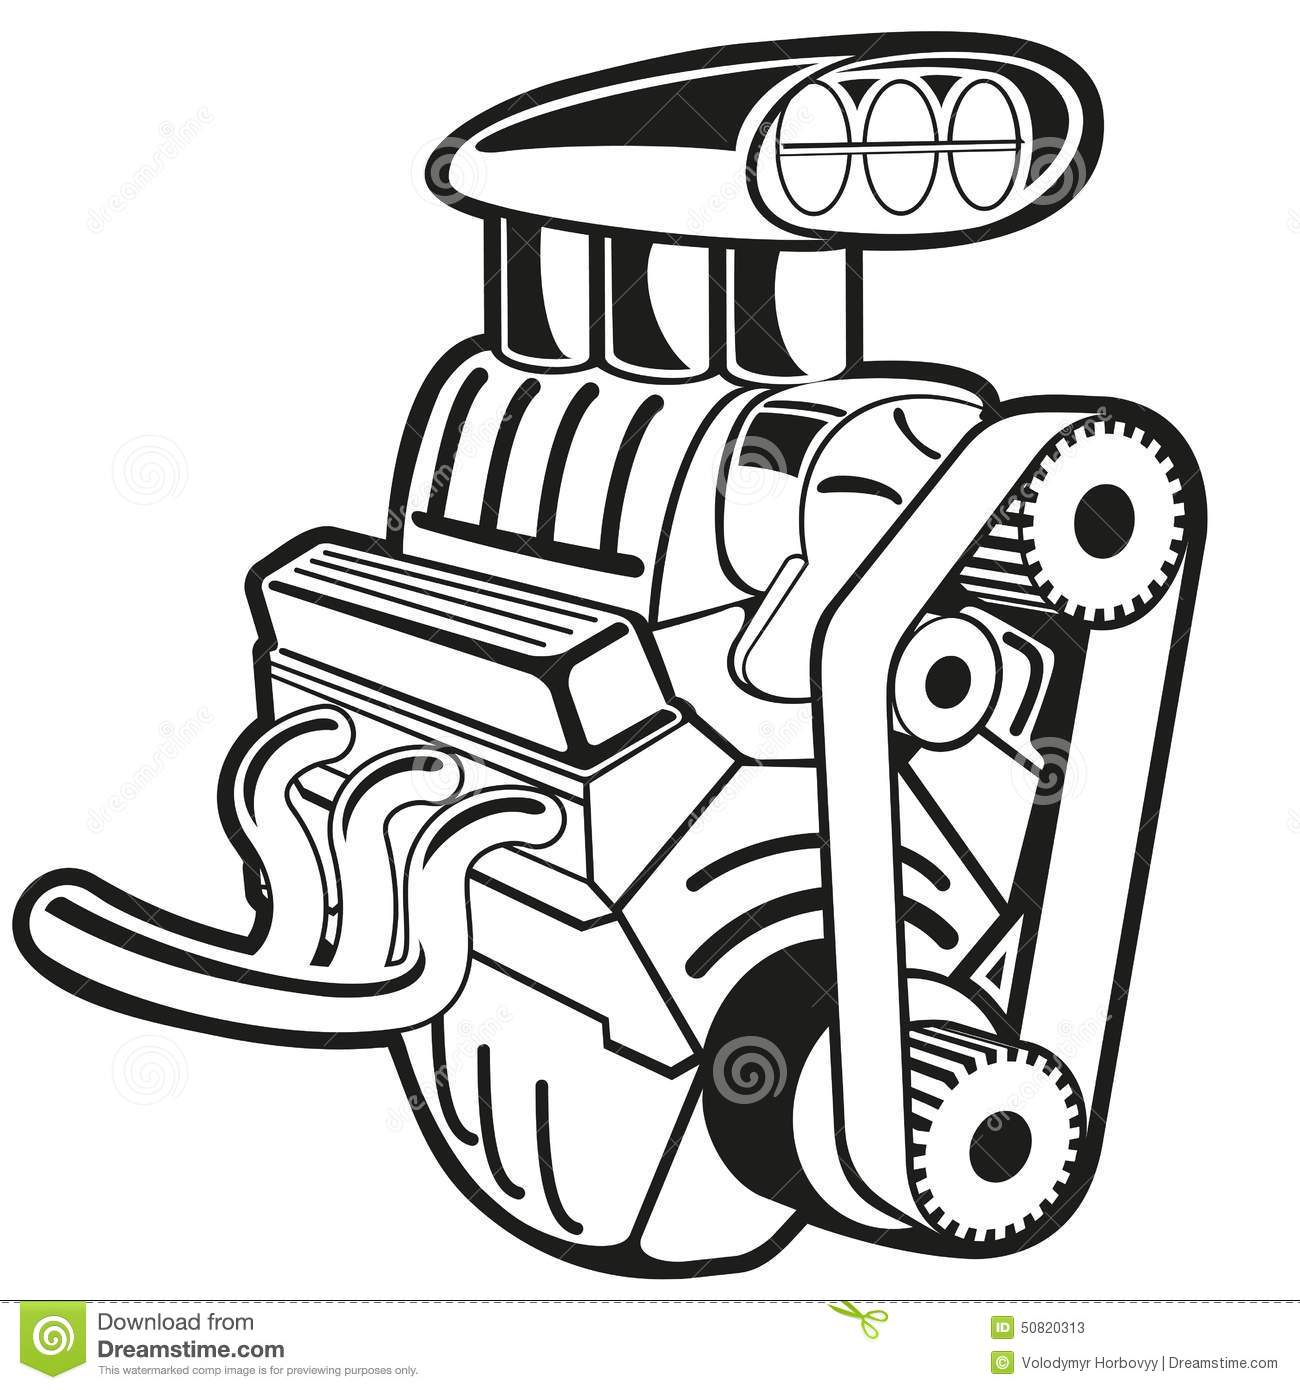 Motor clipart #13, Download drawings